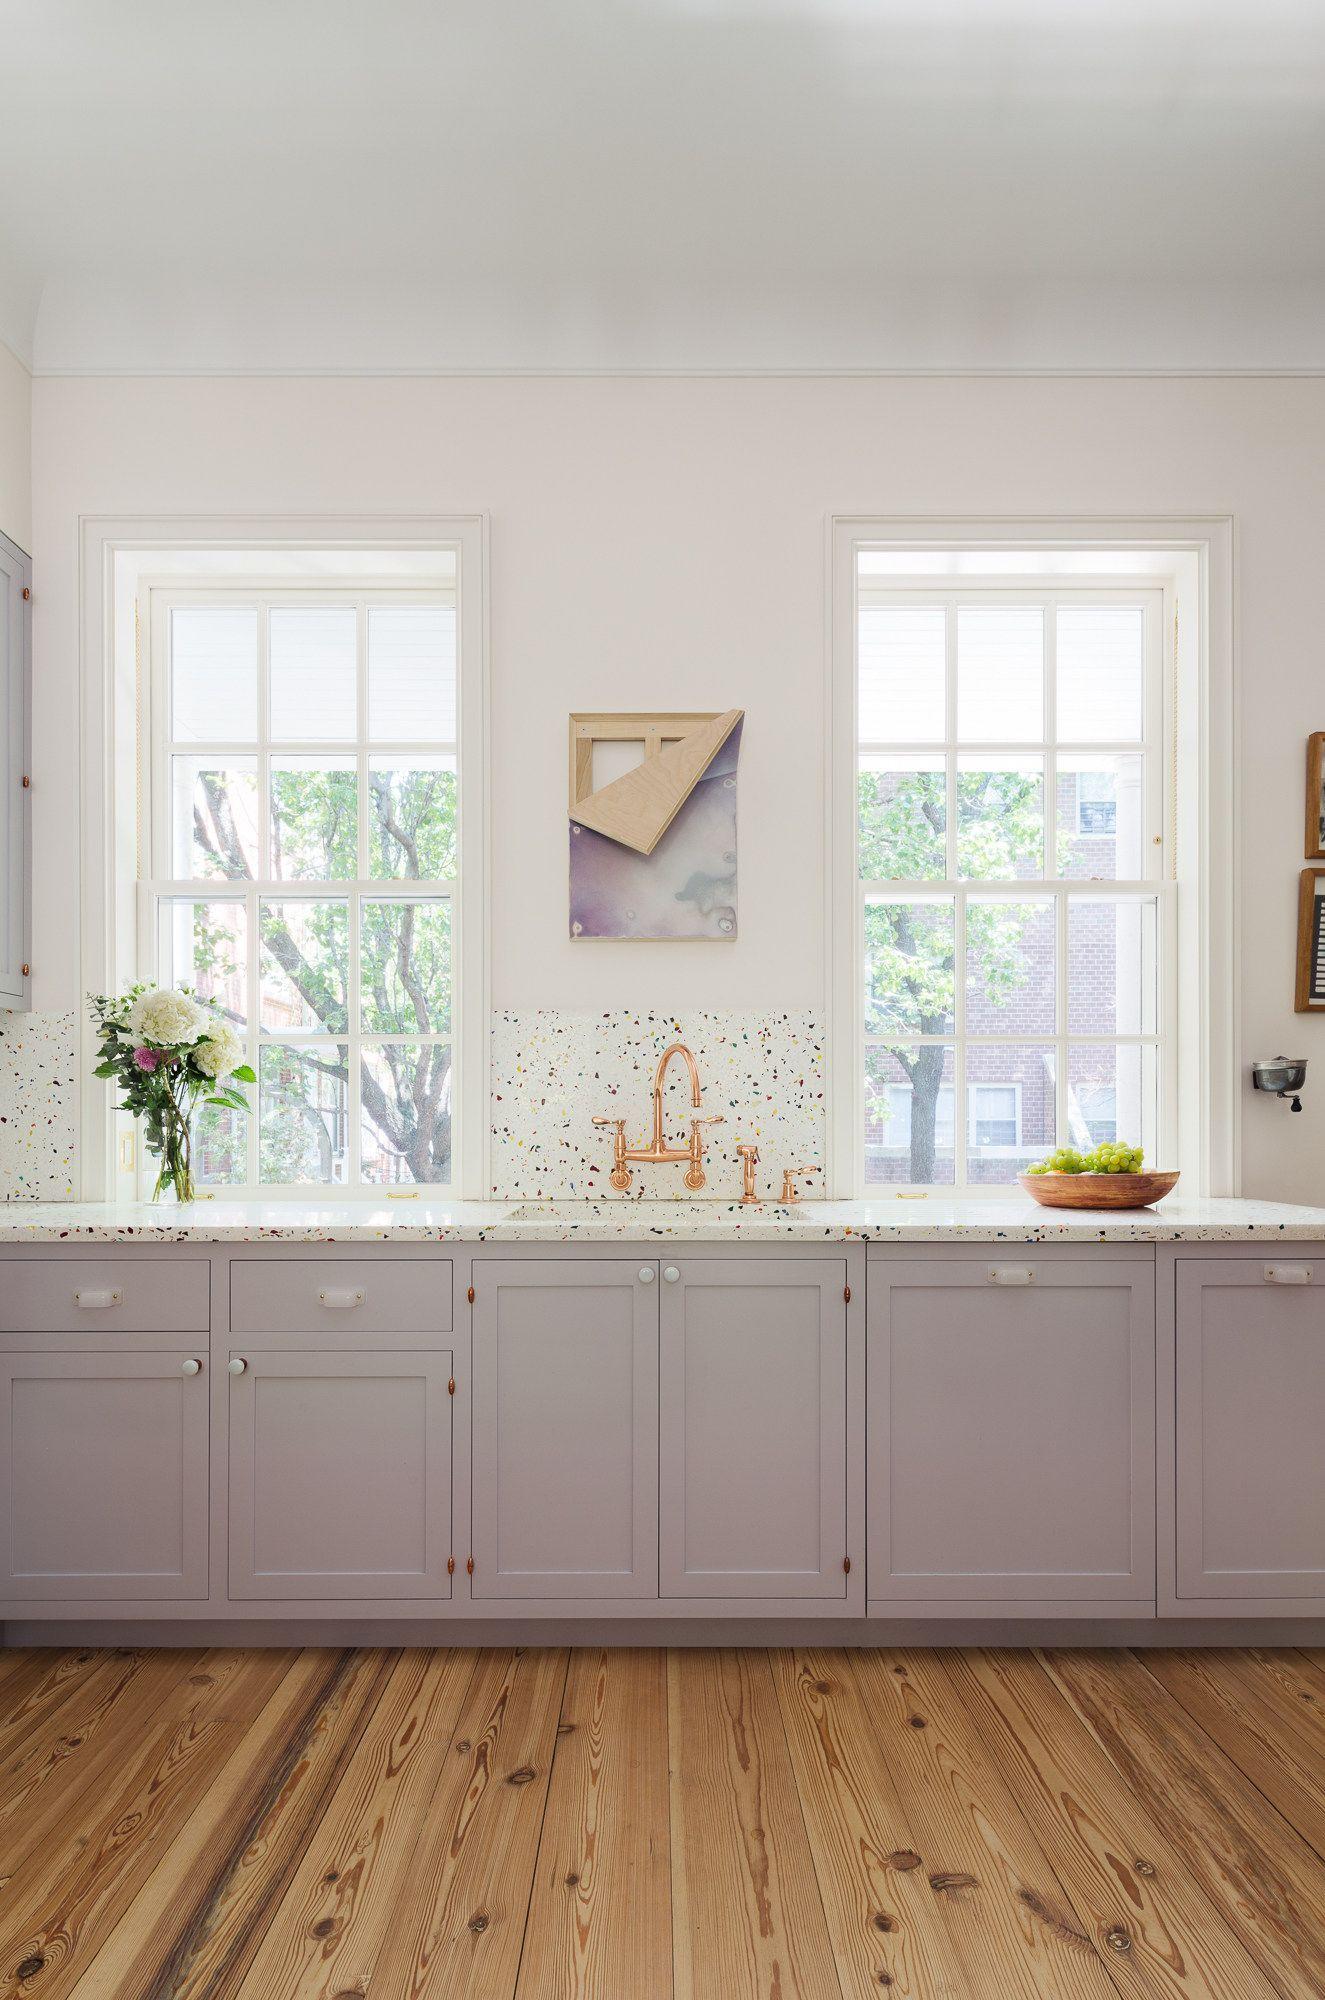 75 Beautiful Japanese Kitchen Ideas Japanese Kitchen Kitchen Design Kitchen Interior